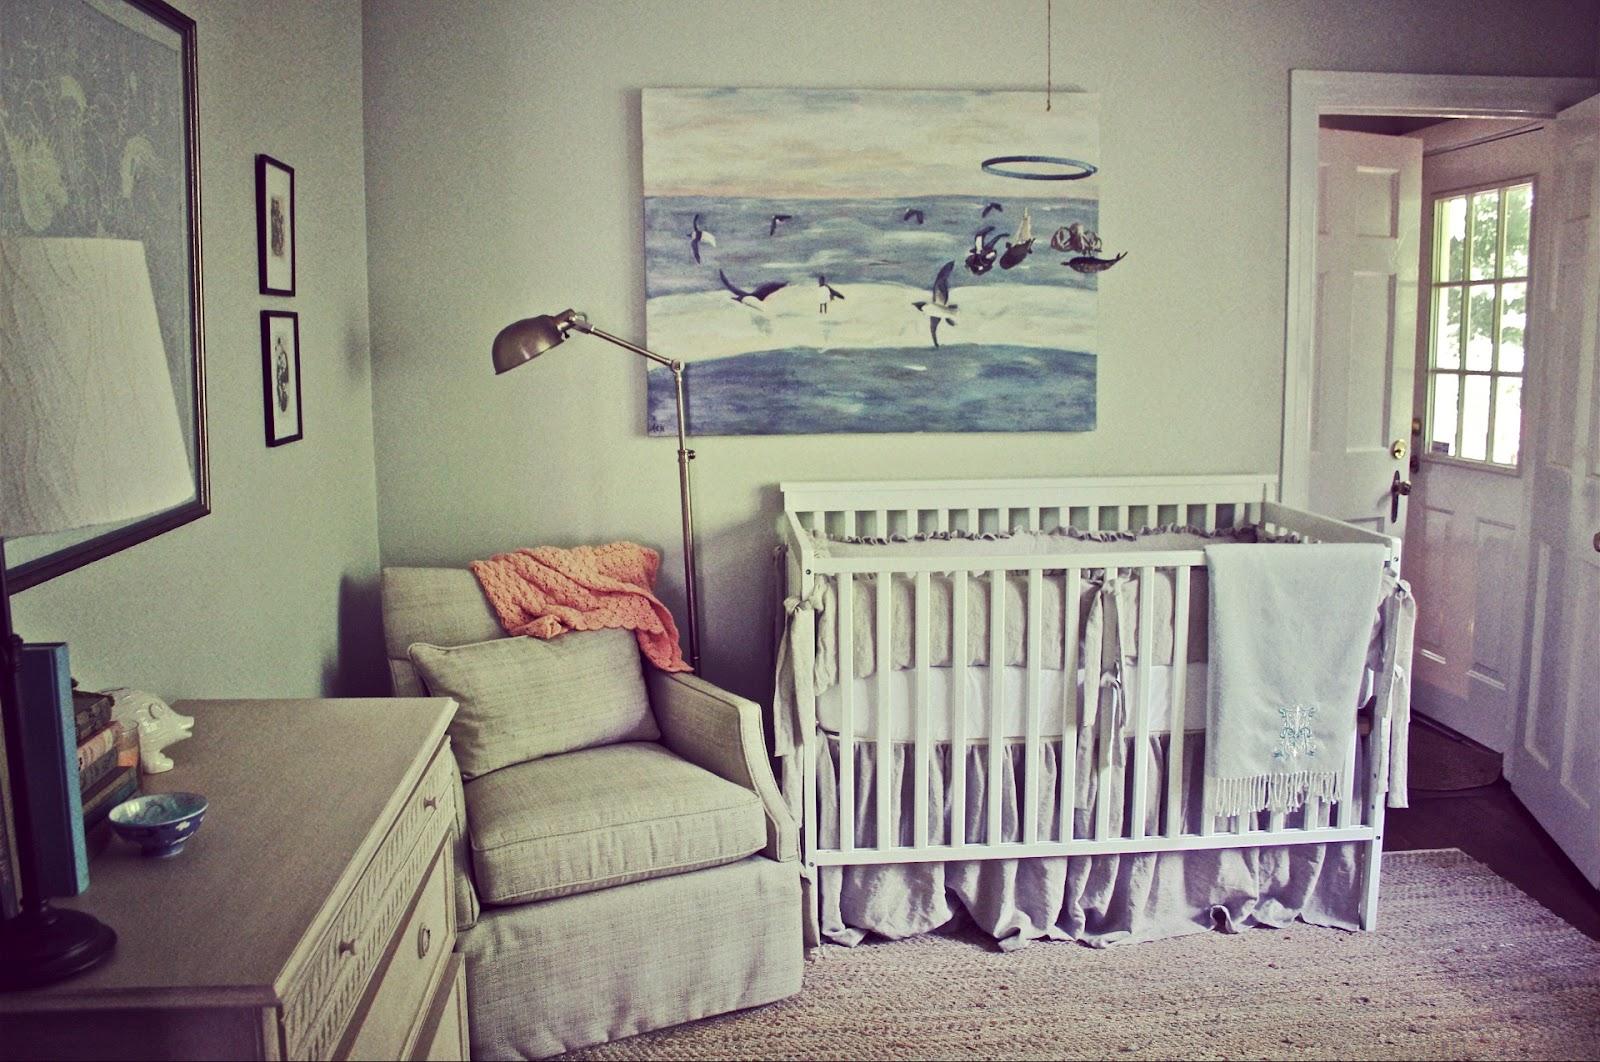 windsor portfolio floor lamp ballard designs outlet julian crib bedding cottage and cabin from etsy